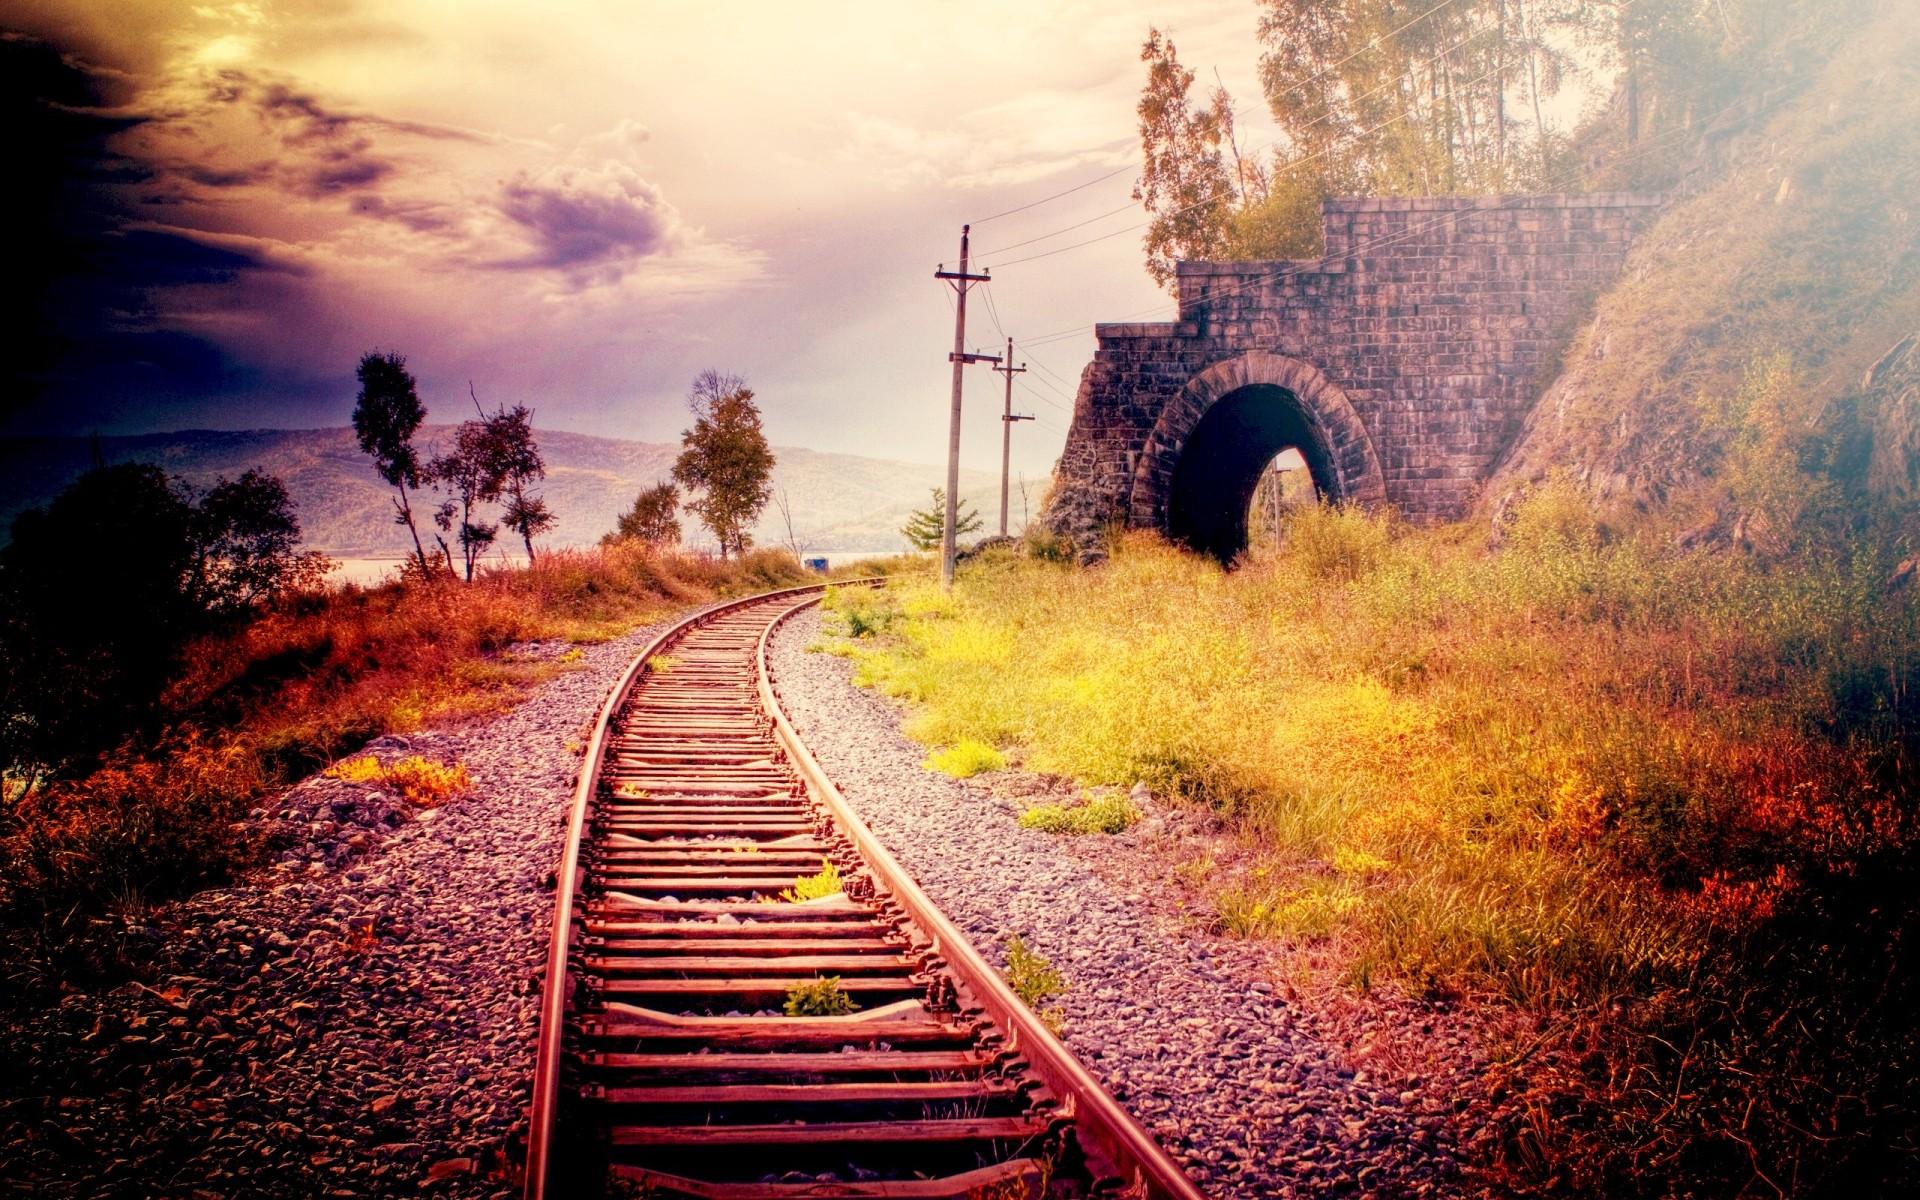 рельсы, шпалы, железная дорога